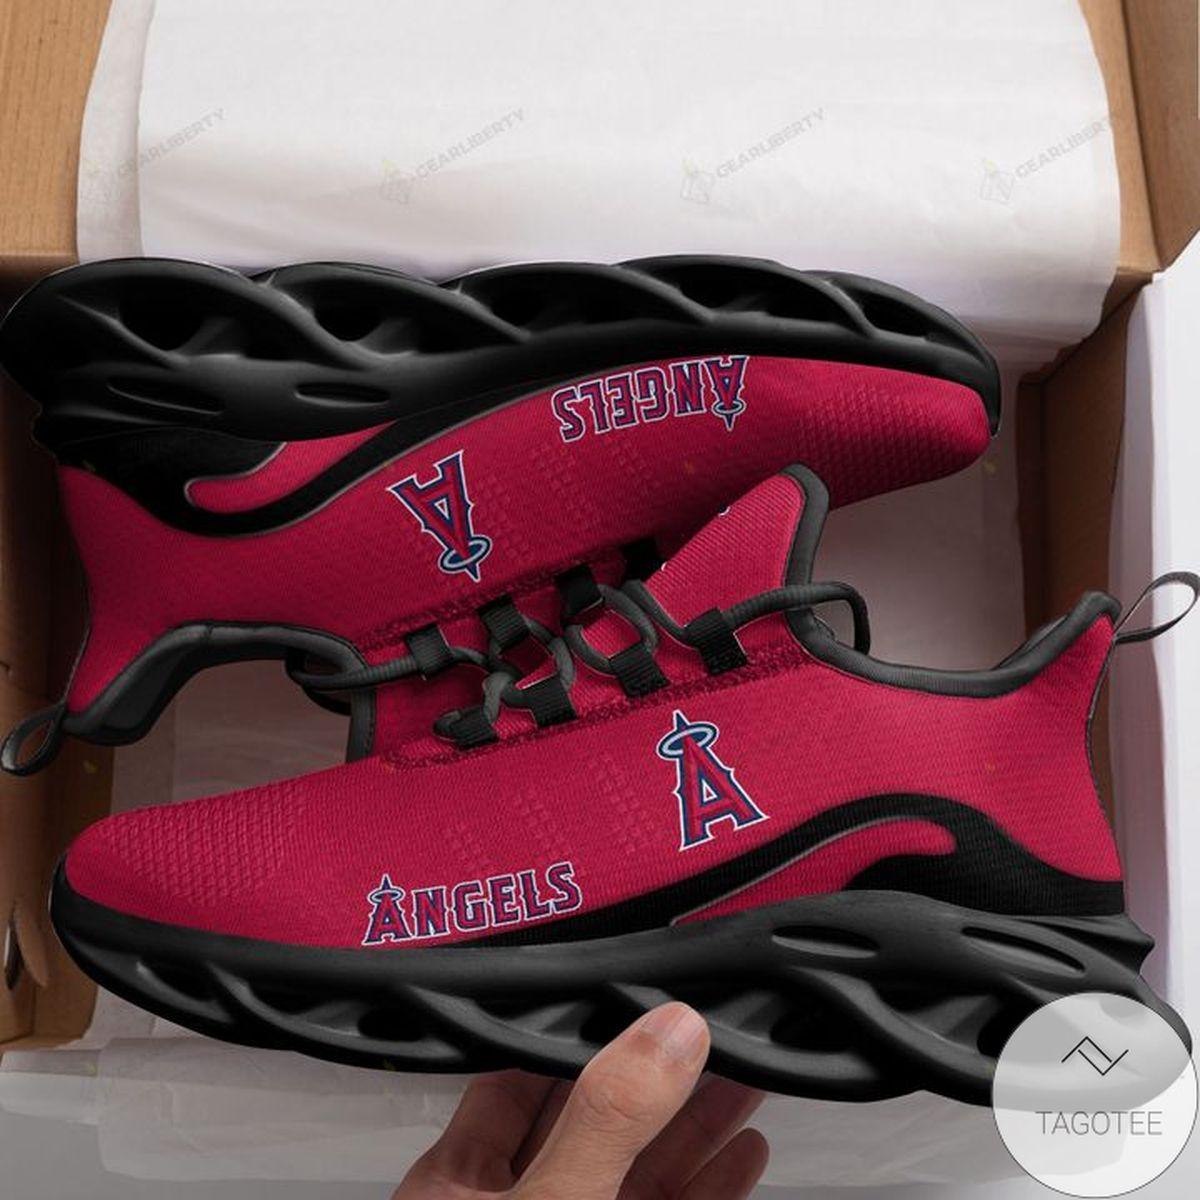 MLB Los Angeles Angels Max Soul Shoes